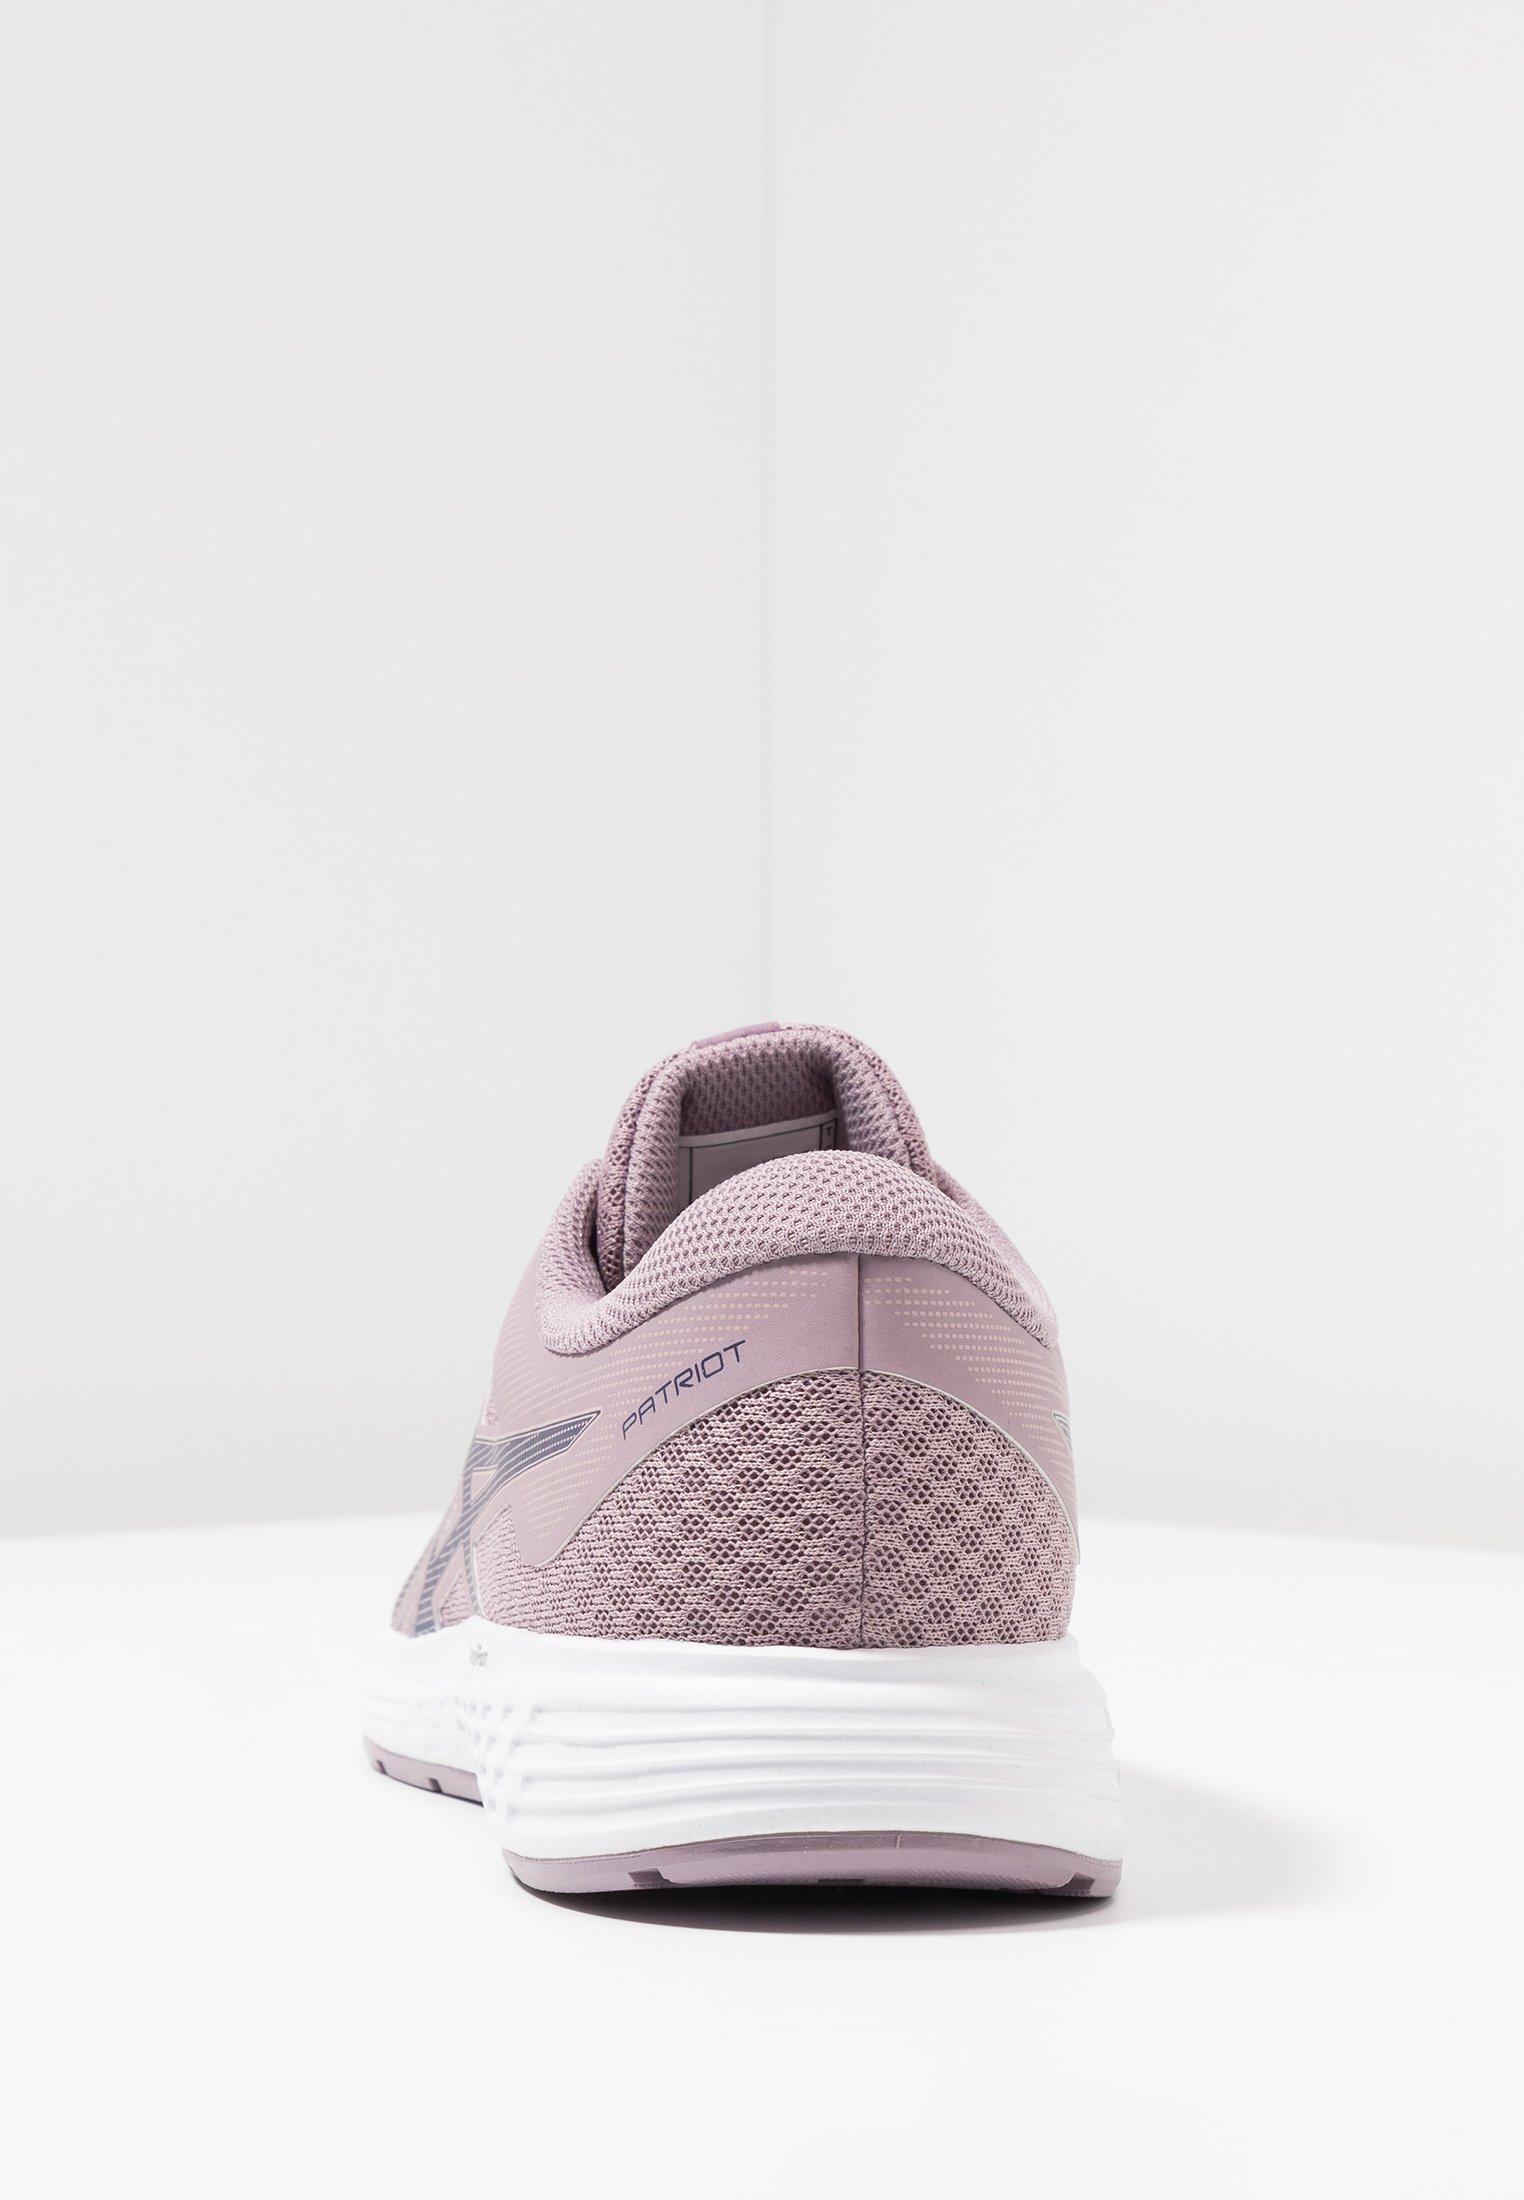 Asics Patriot 11 - Neutral Running Shoes Violet Blush/purple Matte